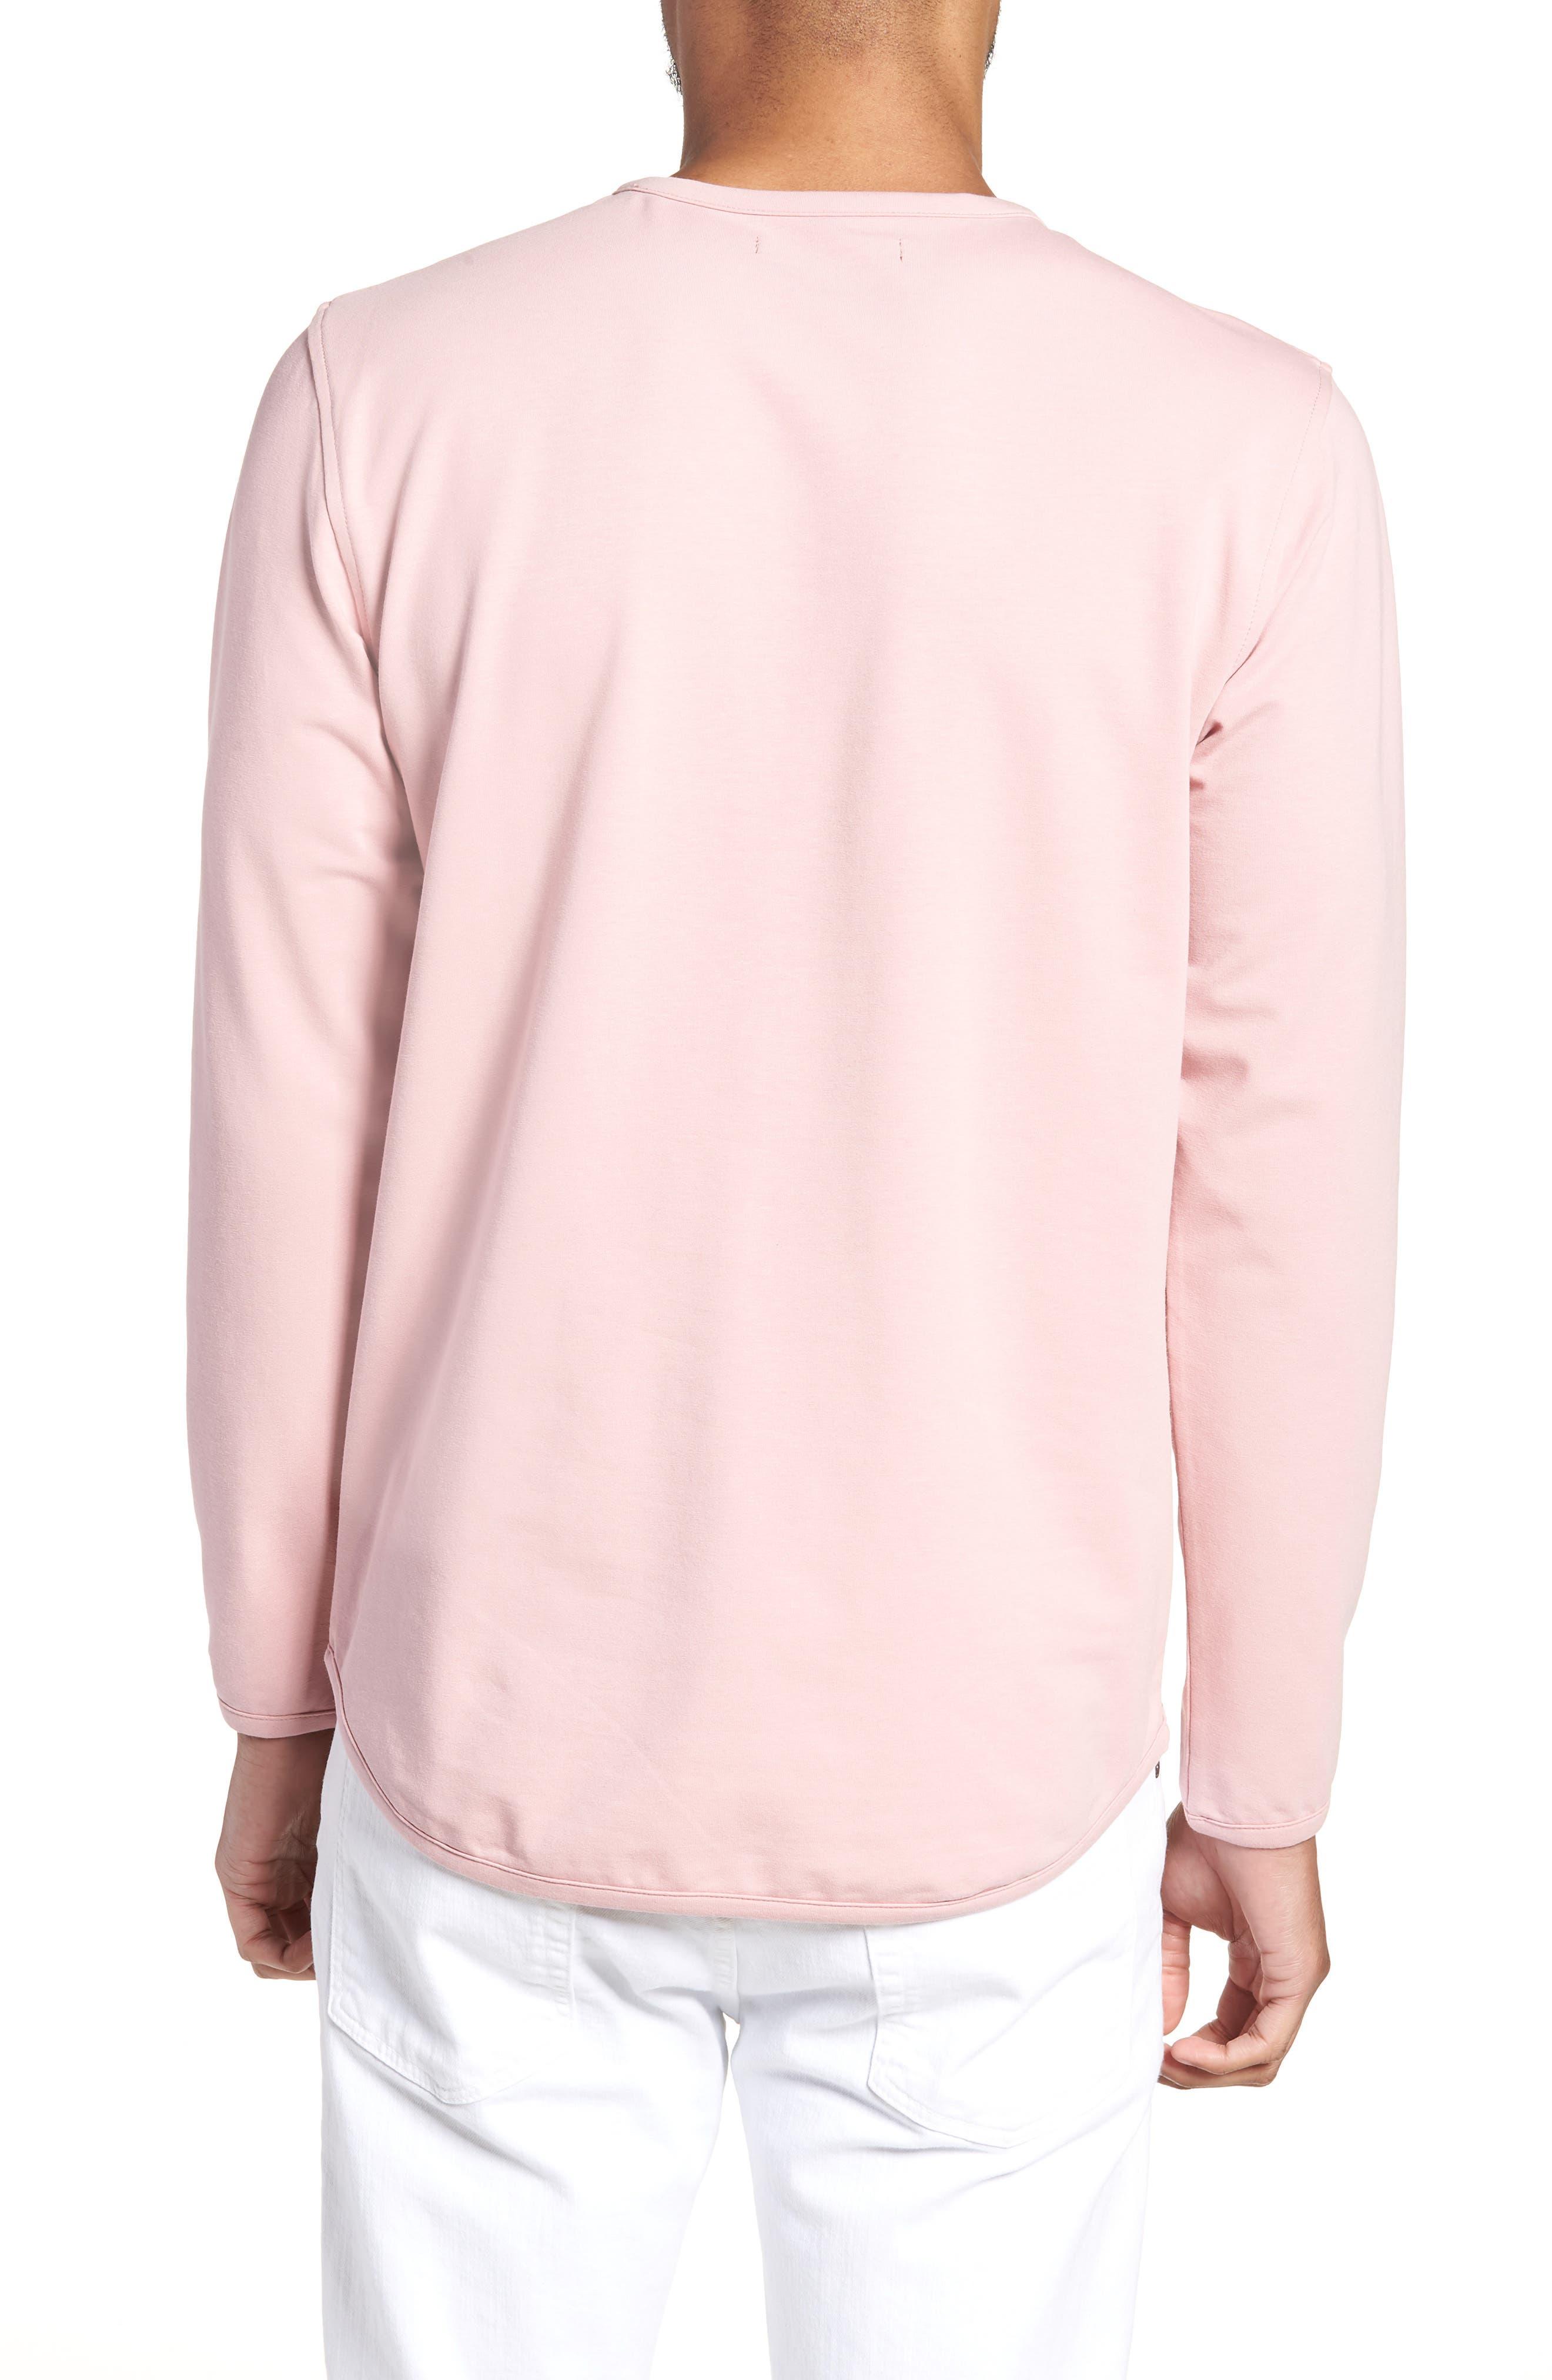 Trim Fit Long Sleeve T-Shirt,                             Alternate thumbnail 2, color,                             Pink